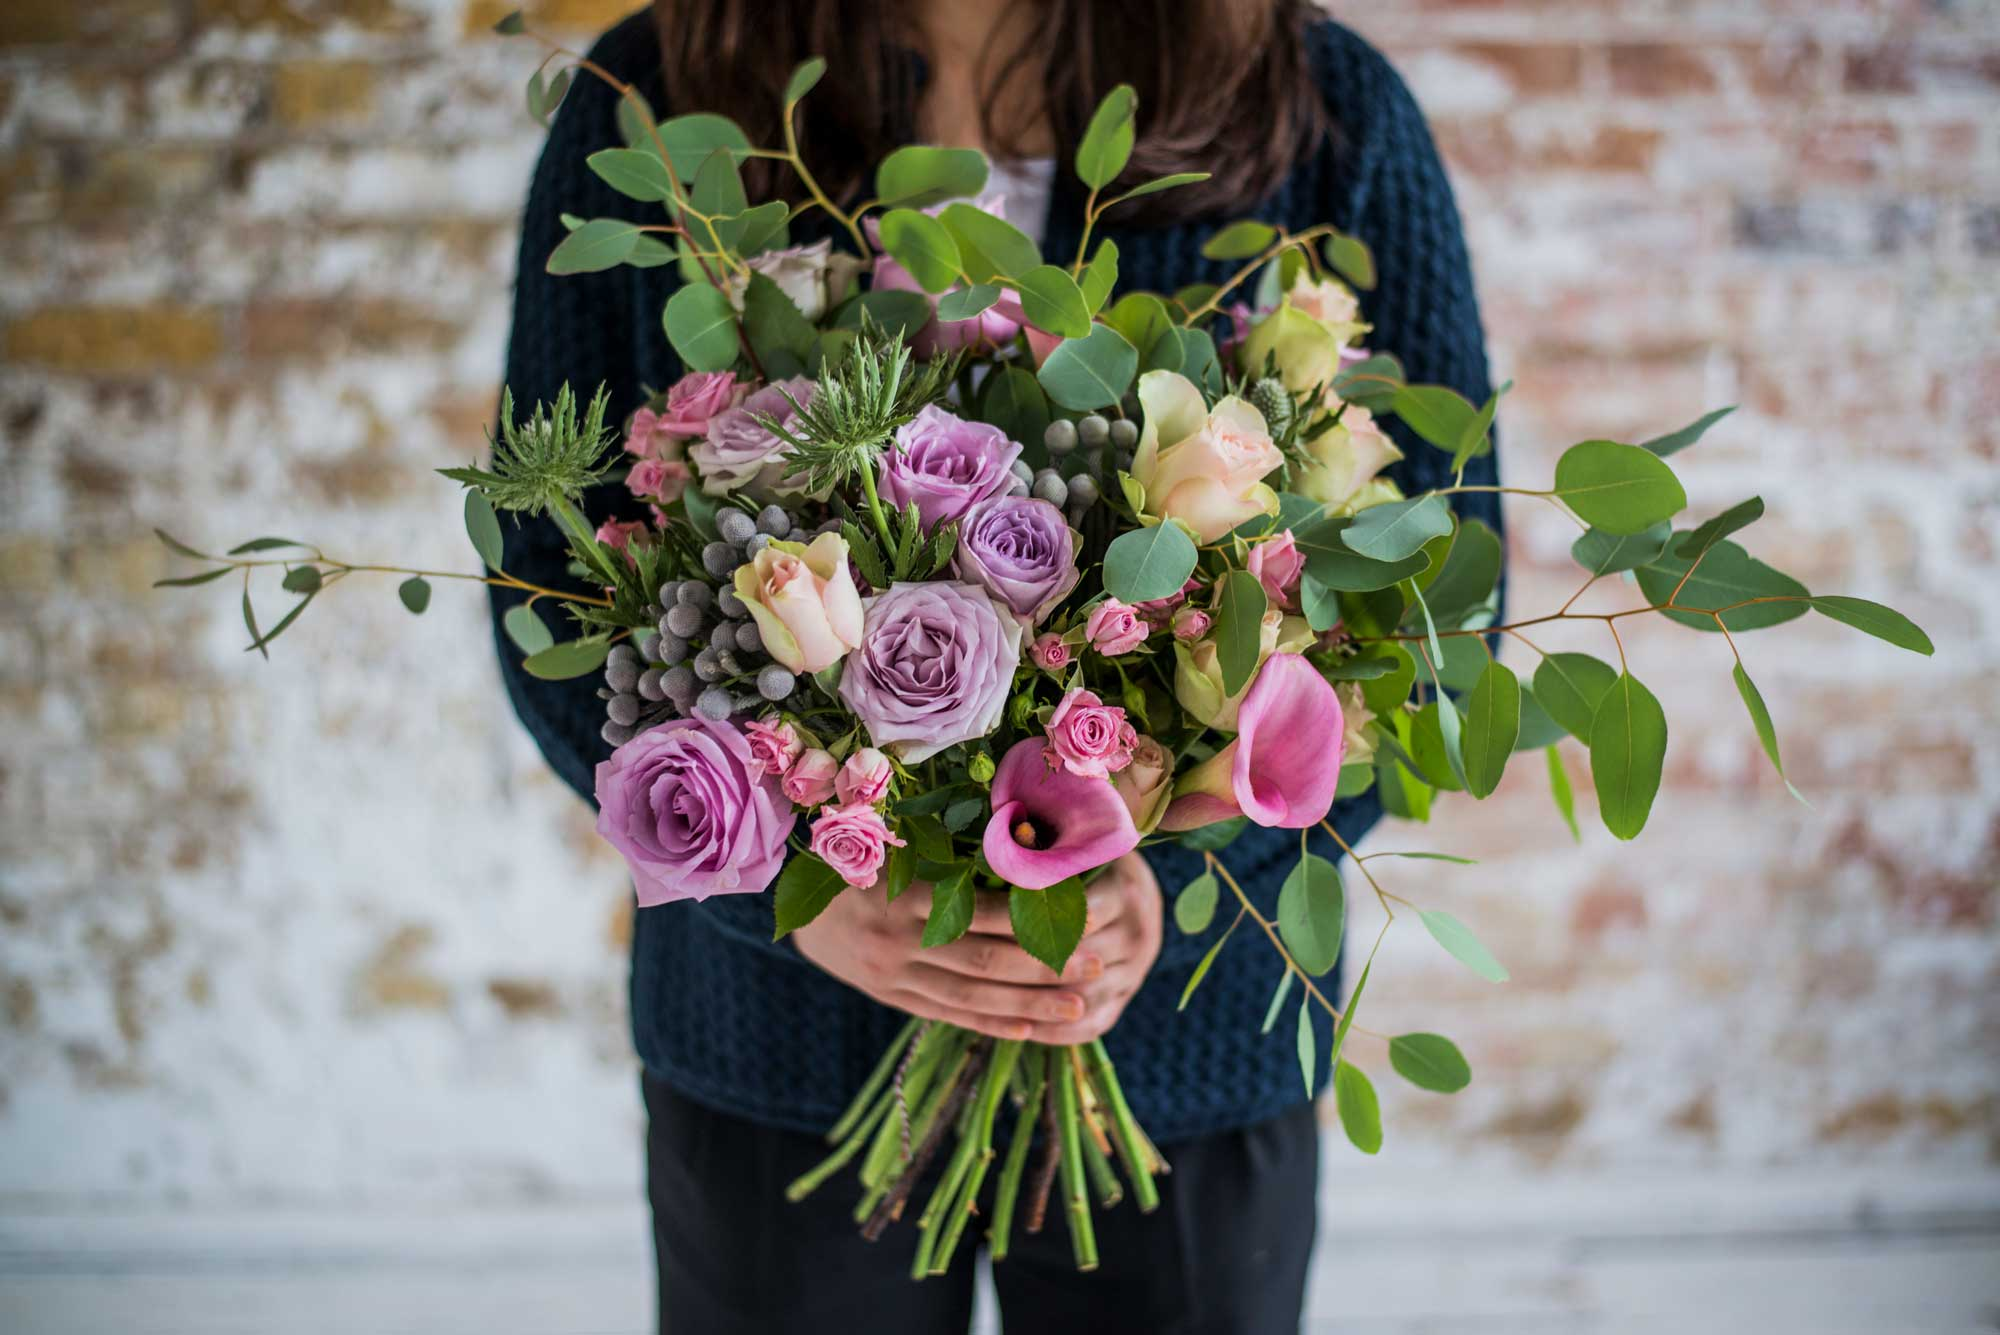 Next day flower delivery bloom wild izmirmasajfo